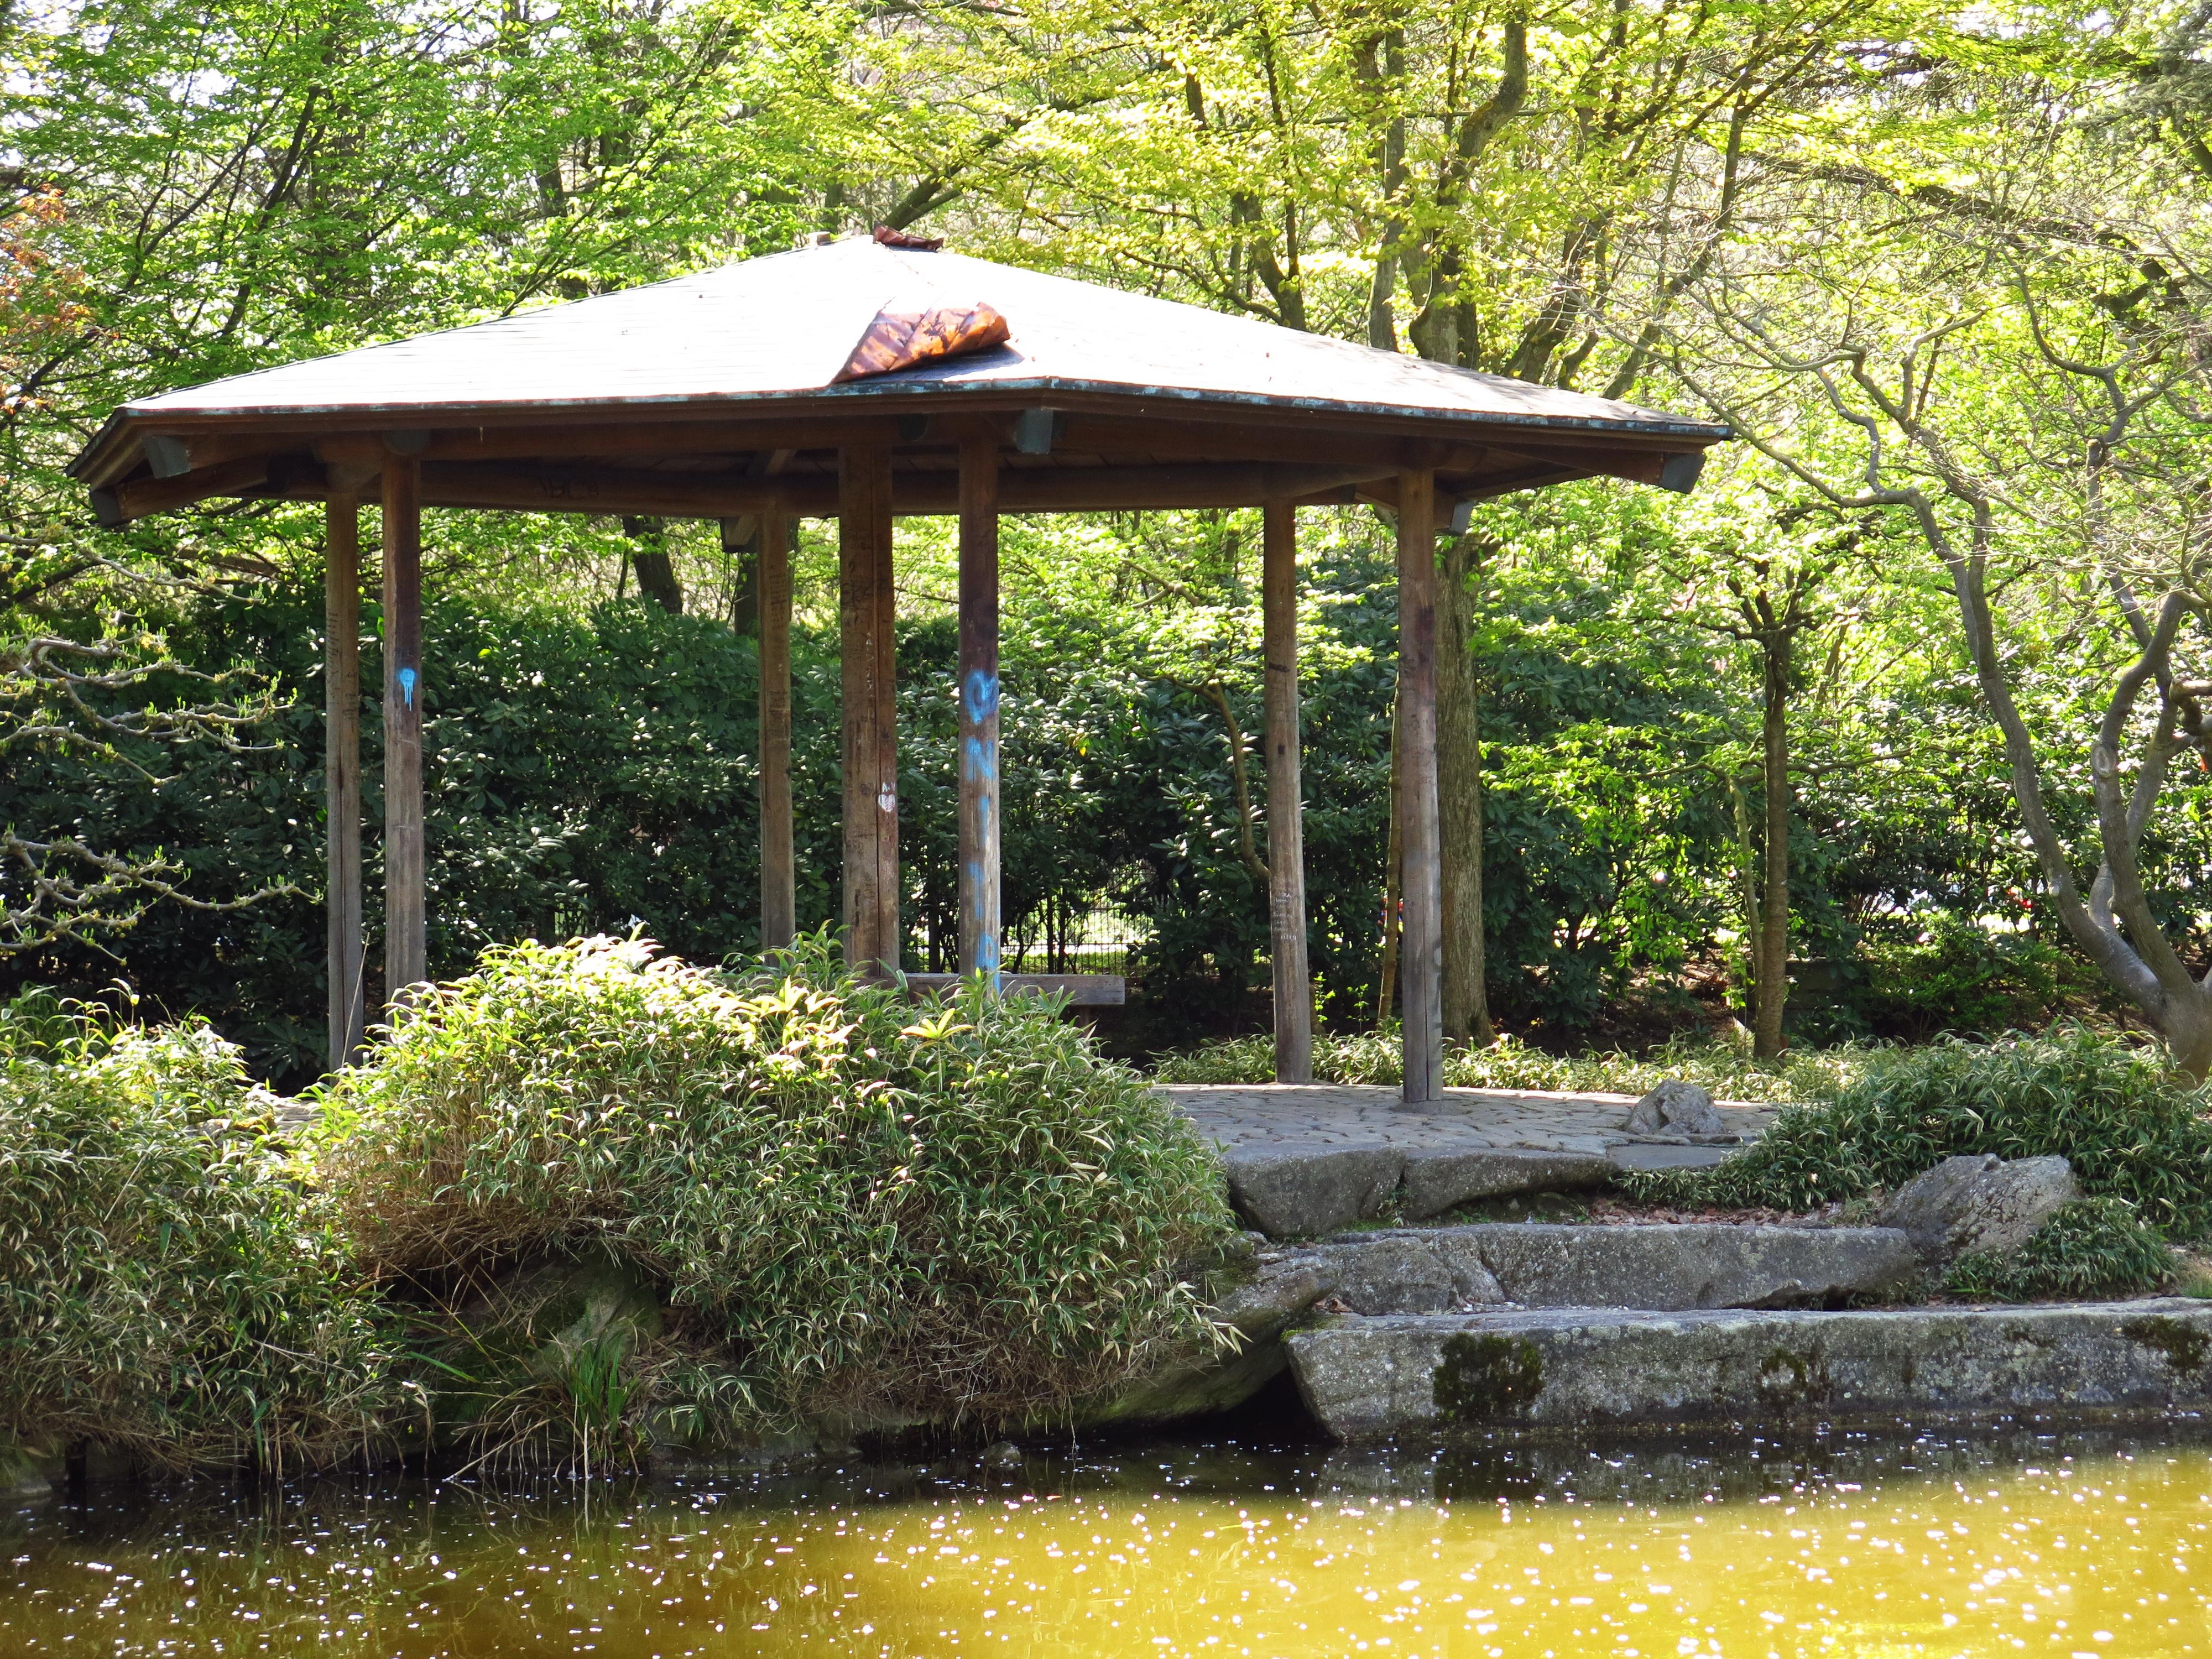 File:Japanischer Garten Teehaus 02